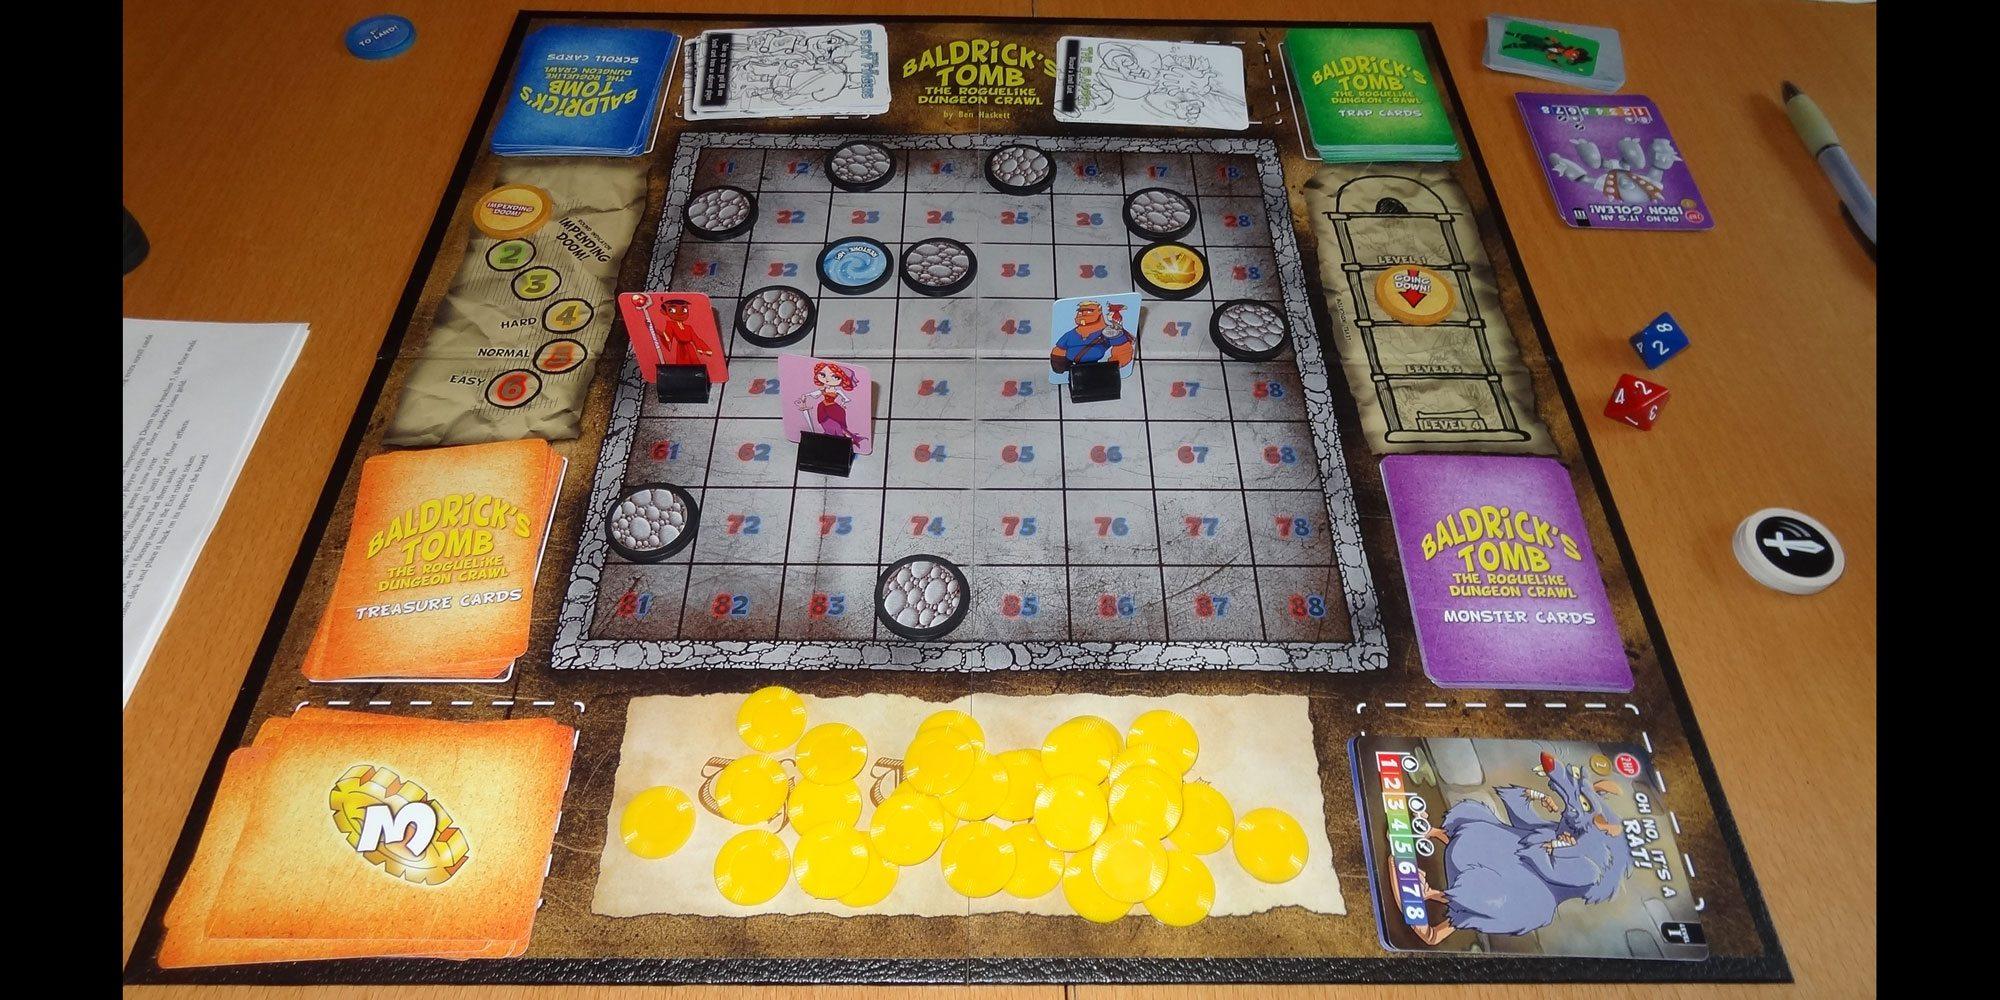 Baldrick's Tomb game in progress